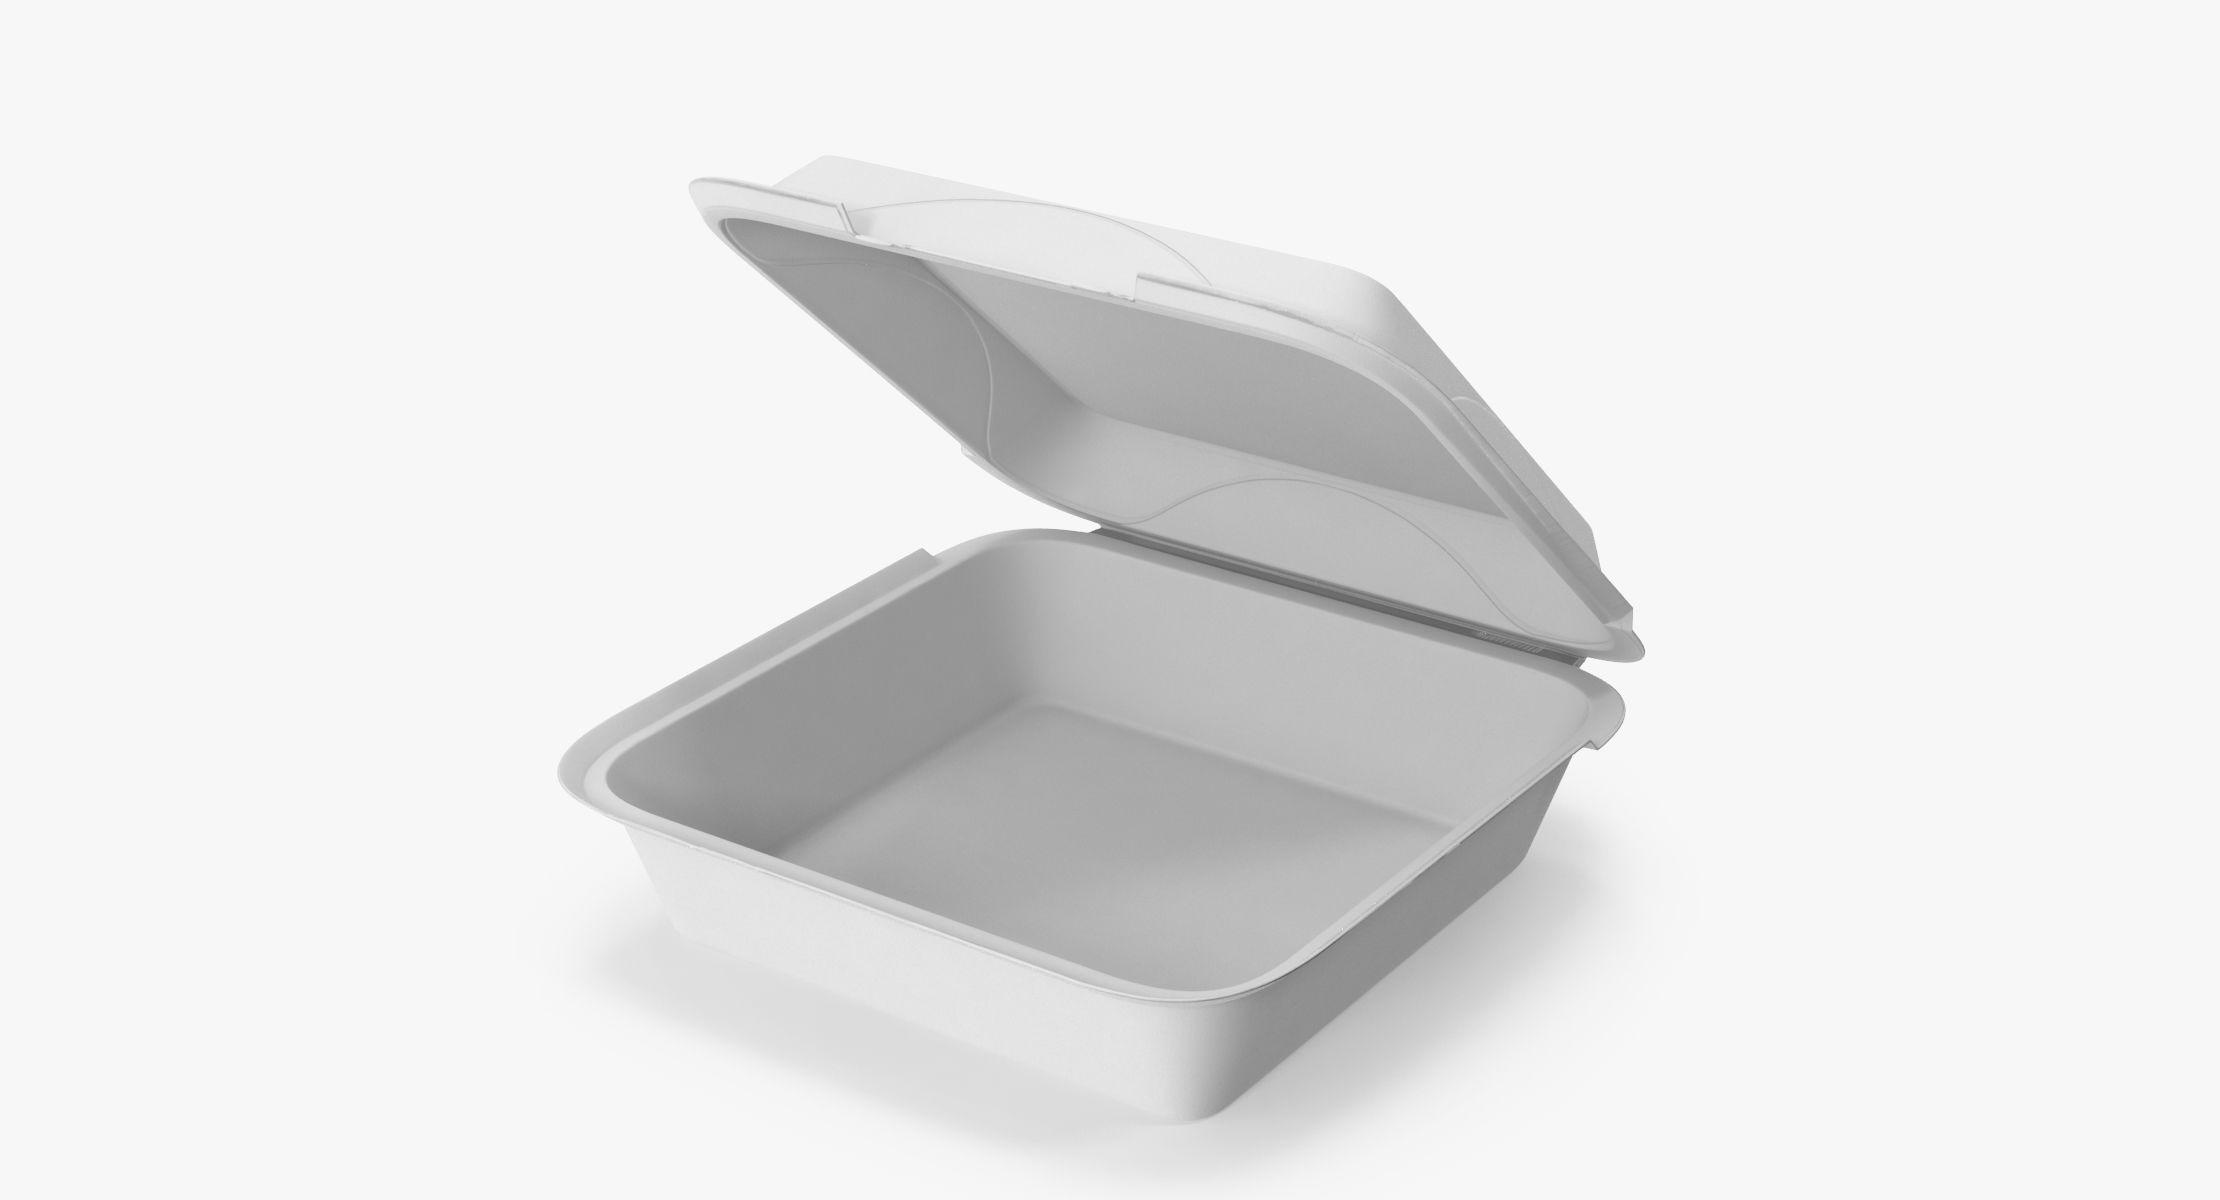 Styrofoam To Go Box Open - reel 1